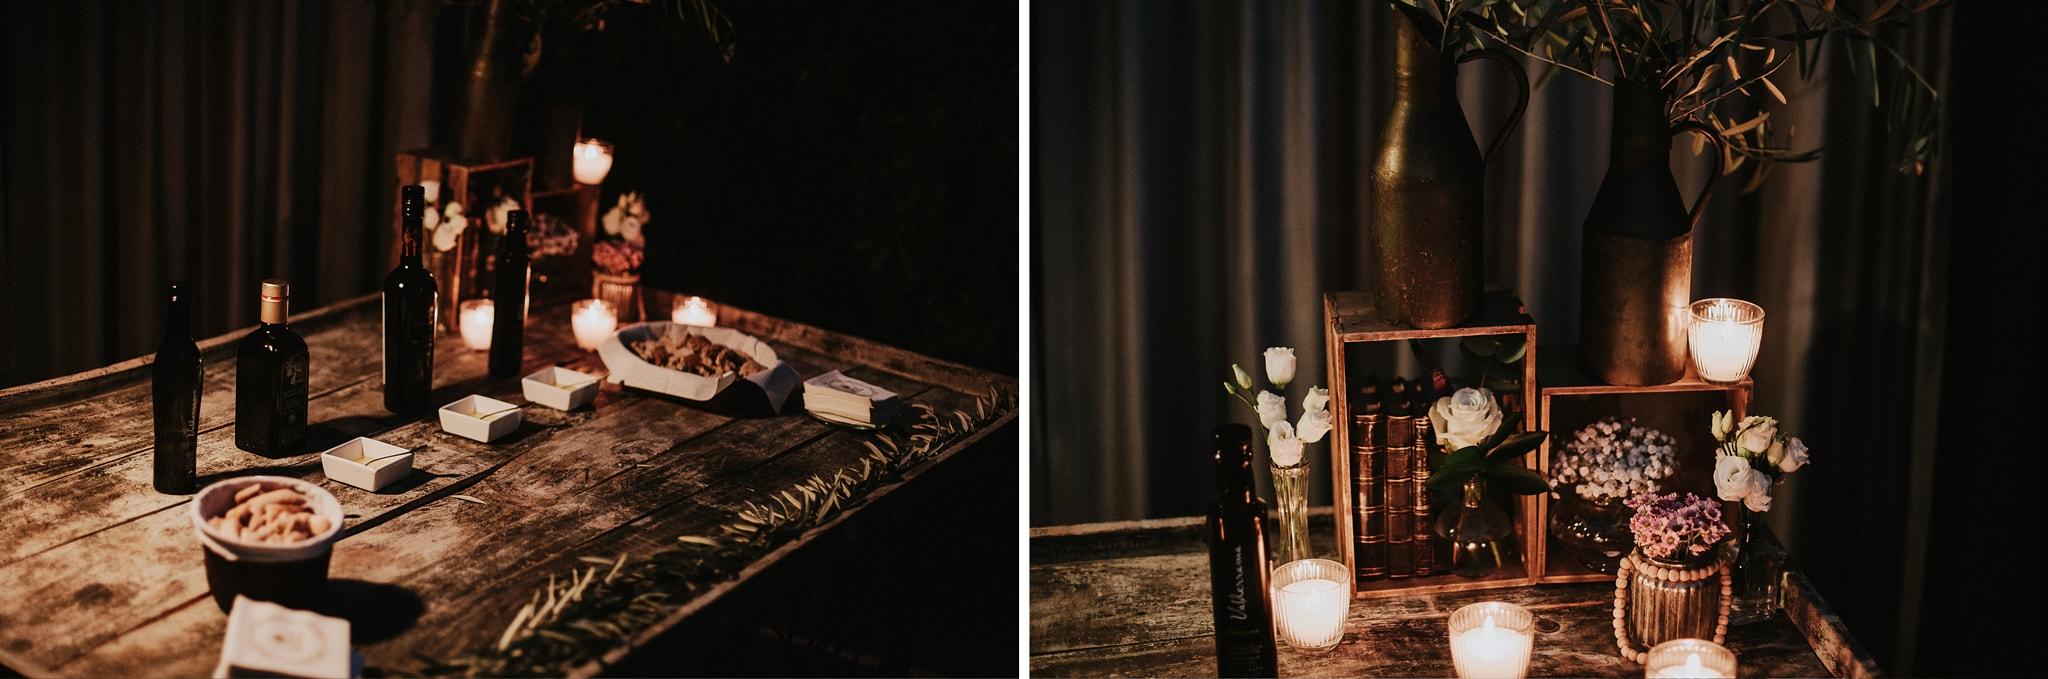 prisma-blanco-fotografos-bodas-toledo-140